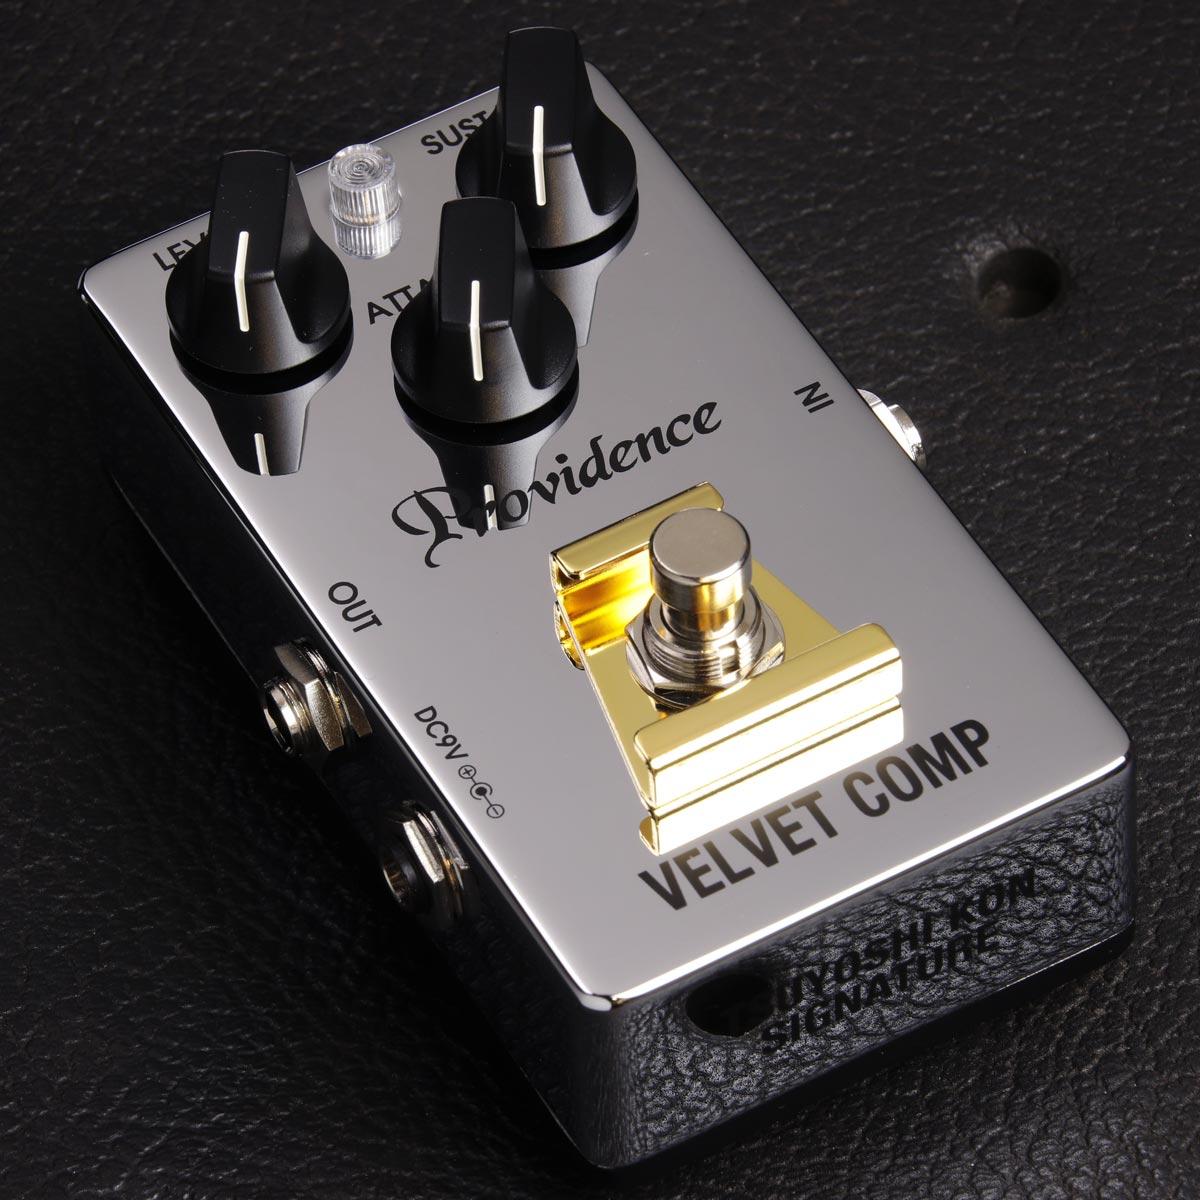 Providence / VLC-1TK [コンプレッサー][今剛シグネチャーモデル]【渋谷店】